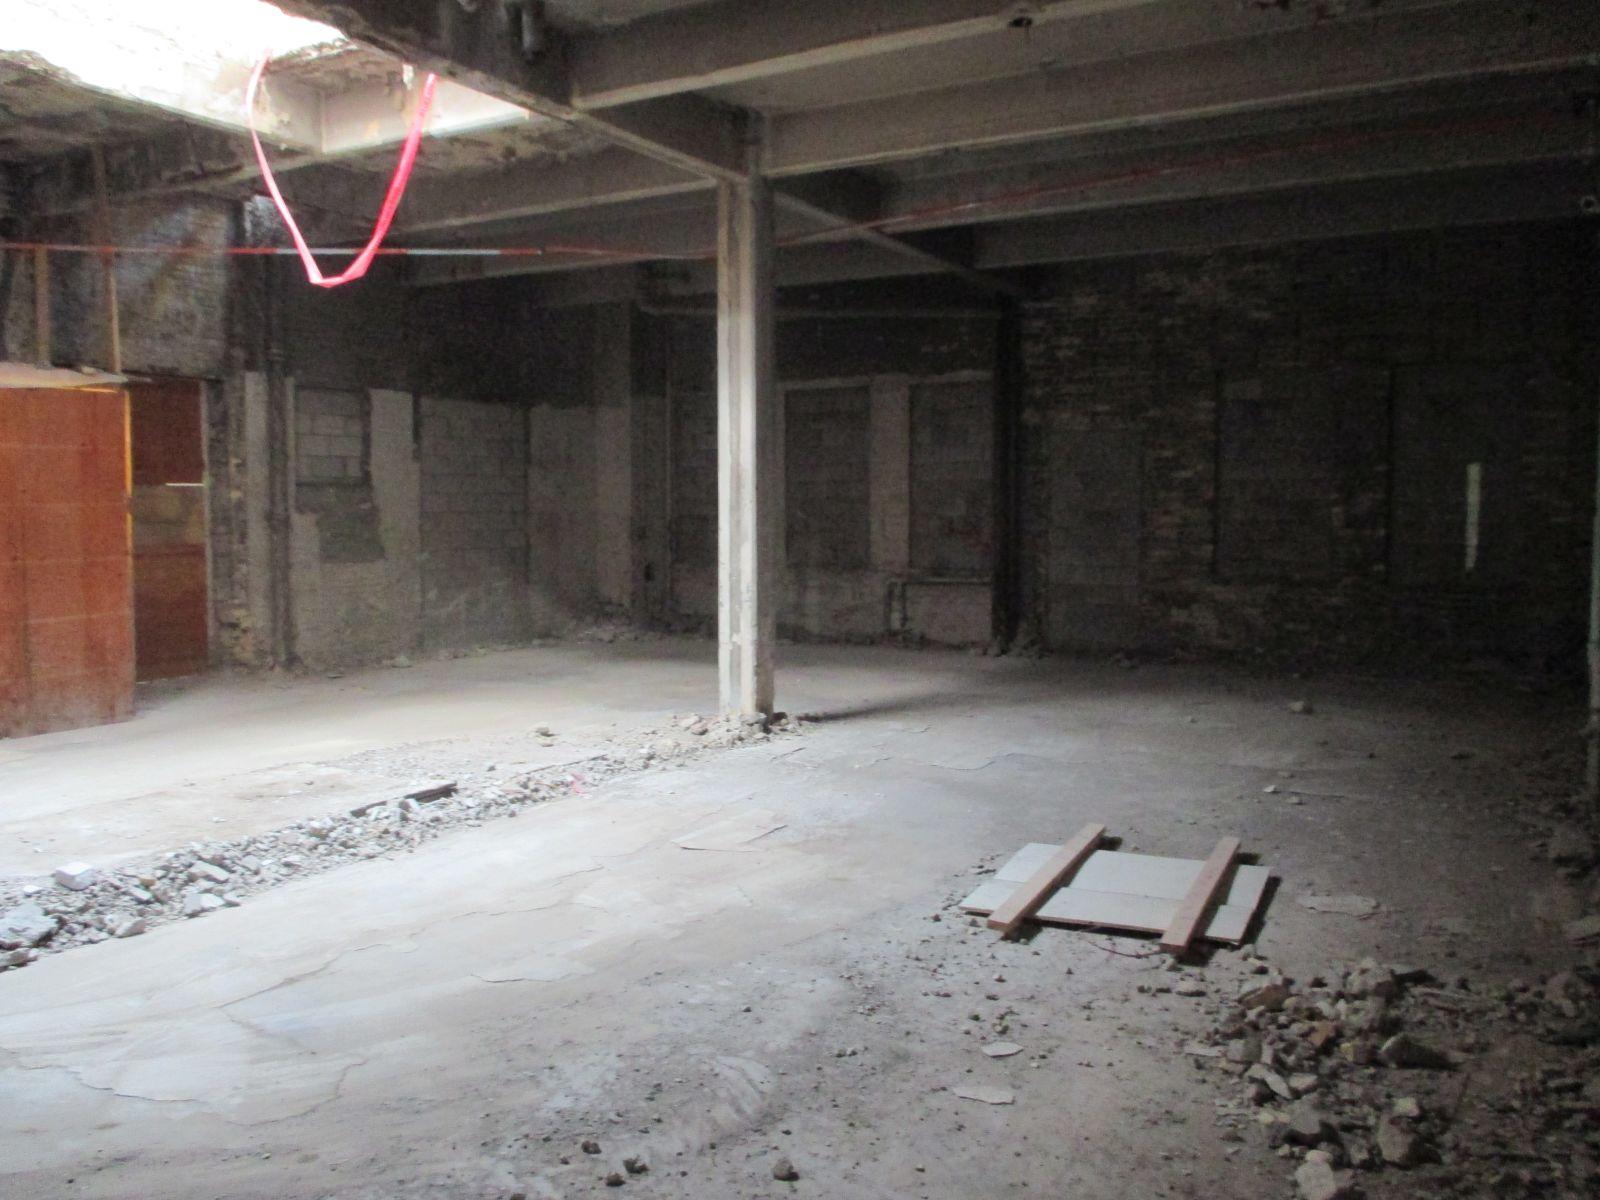 Awaiting Redevelopment